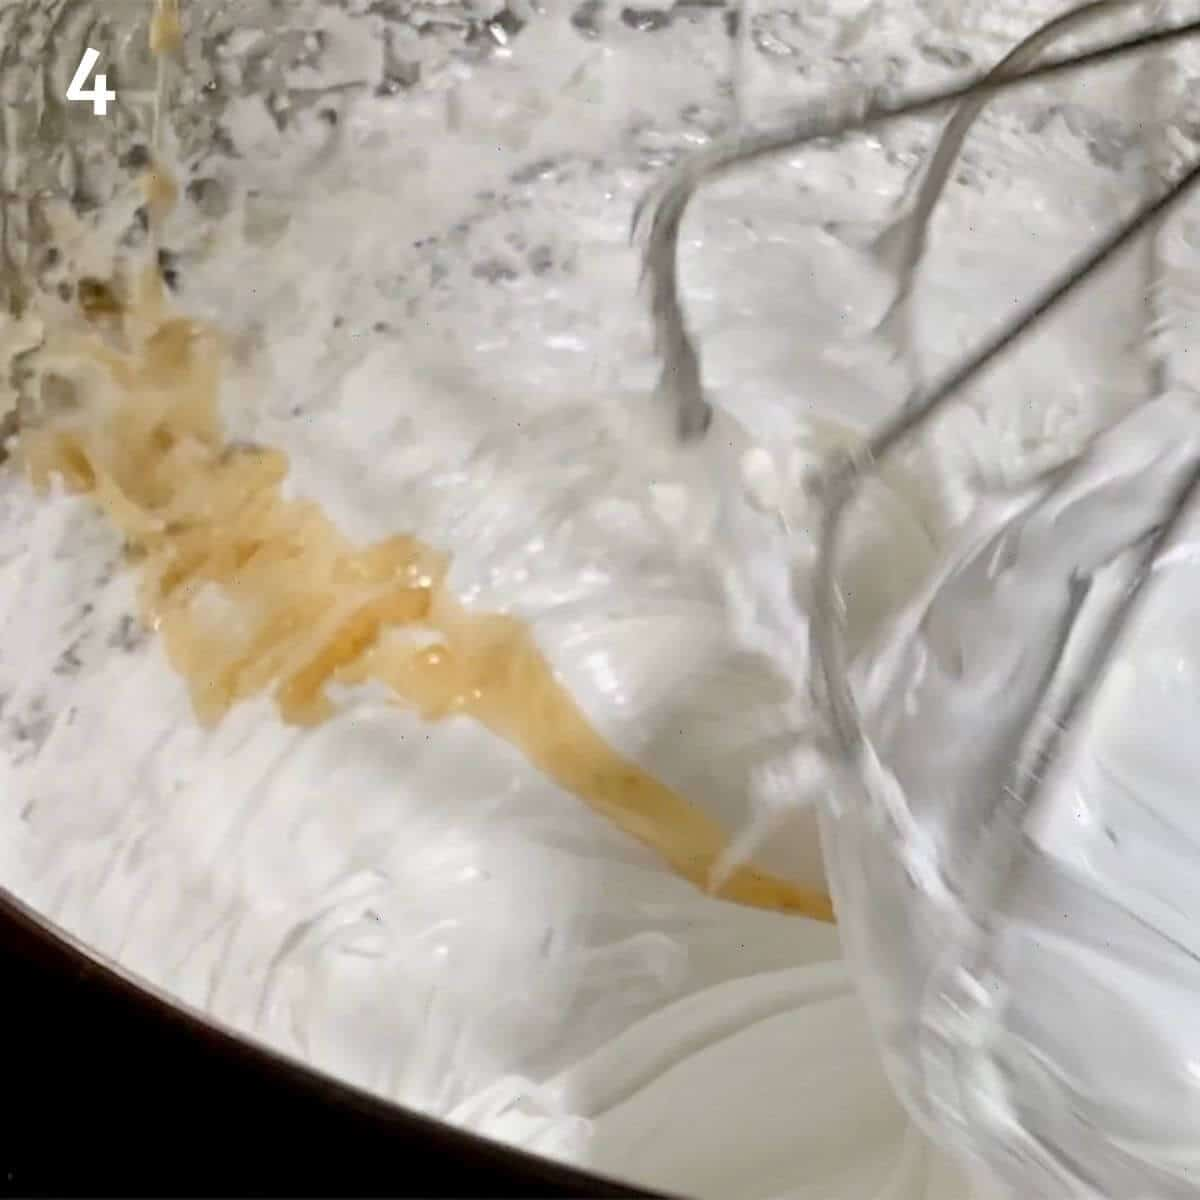 Adding vanilla to marshmallow creme.